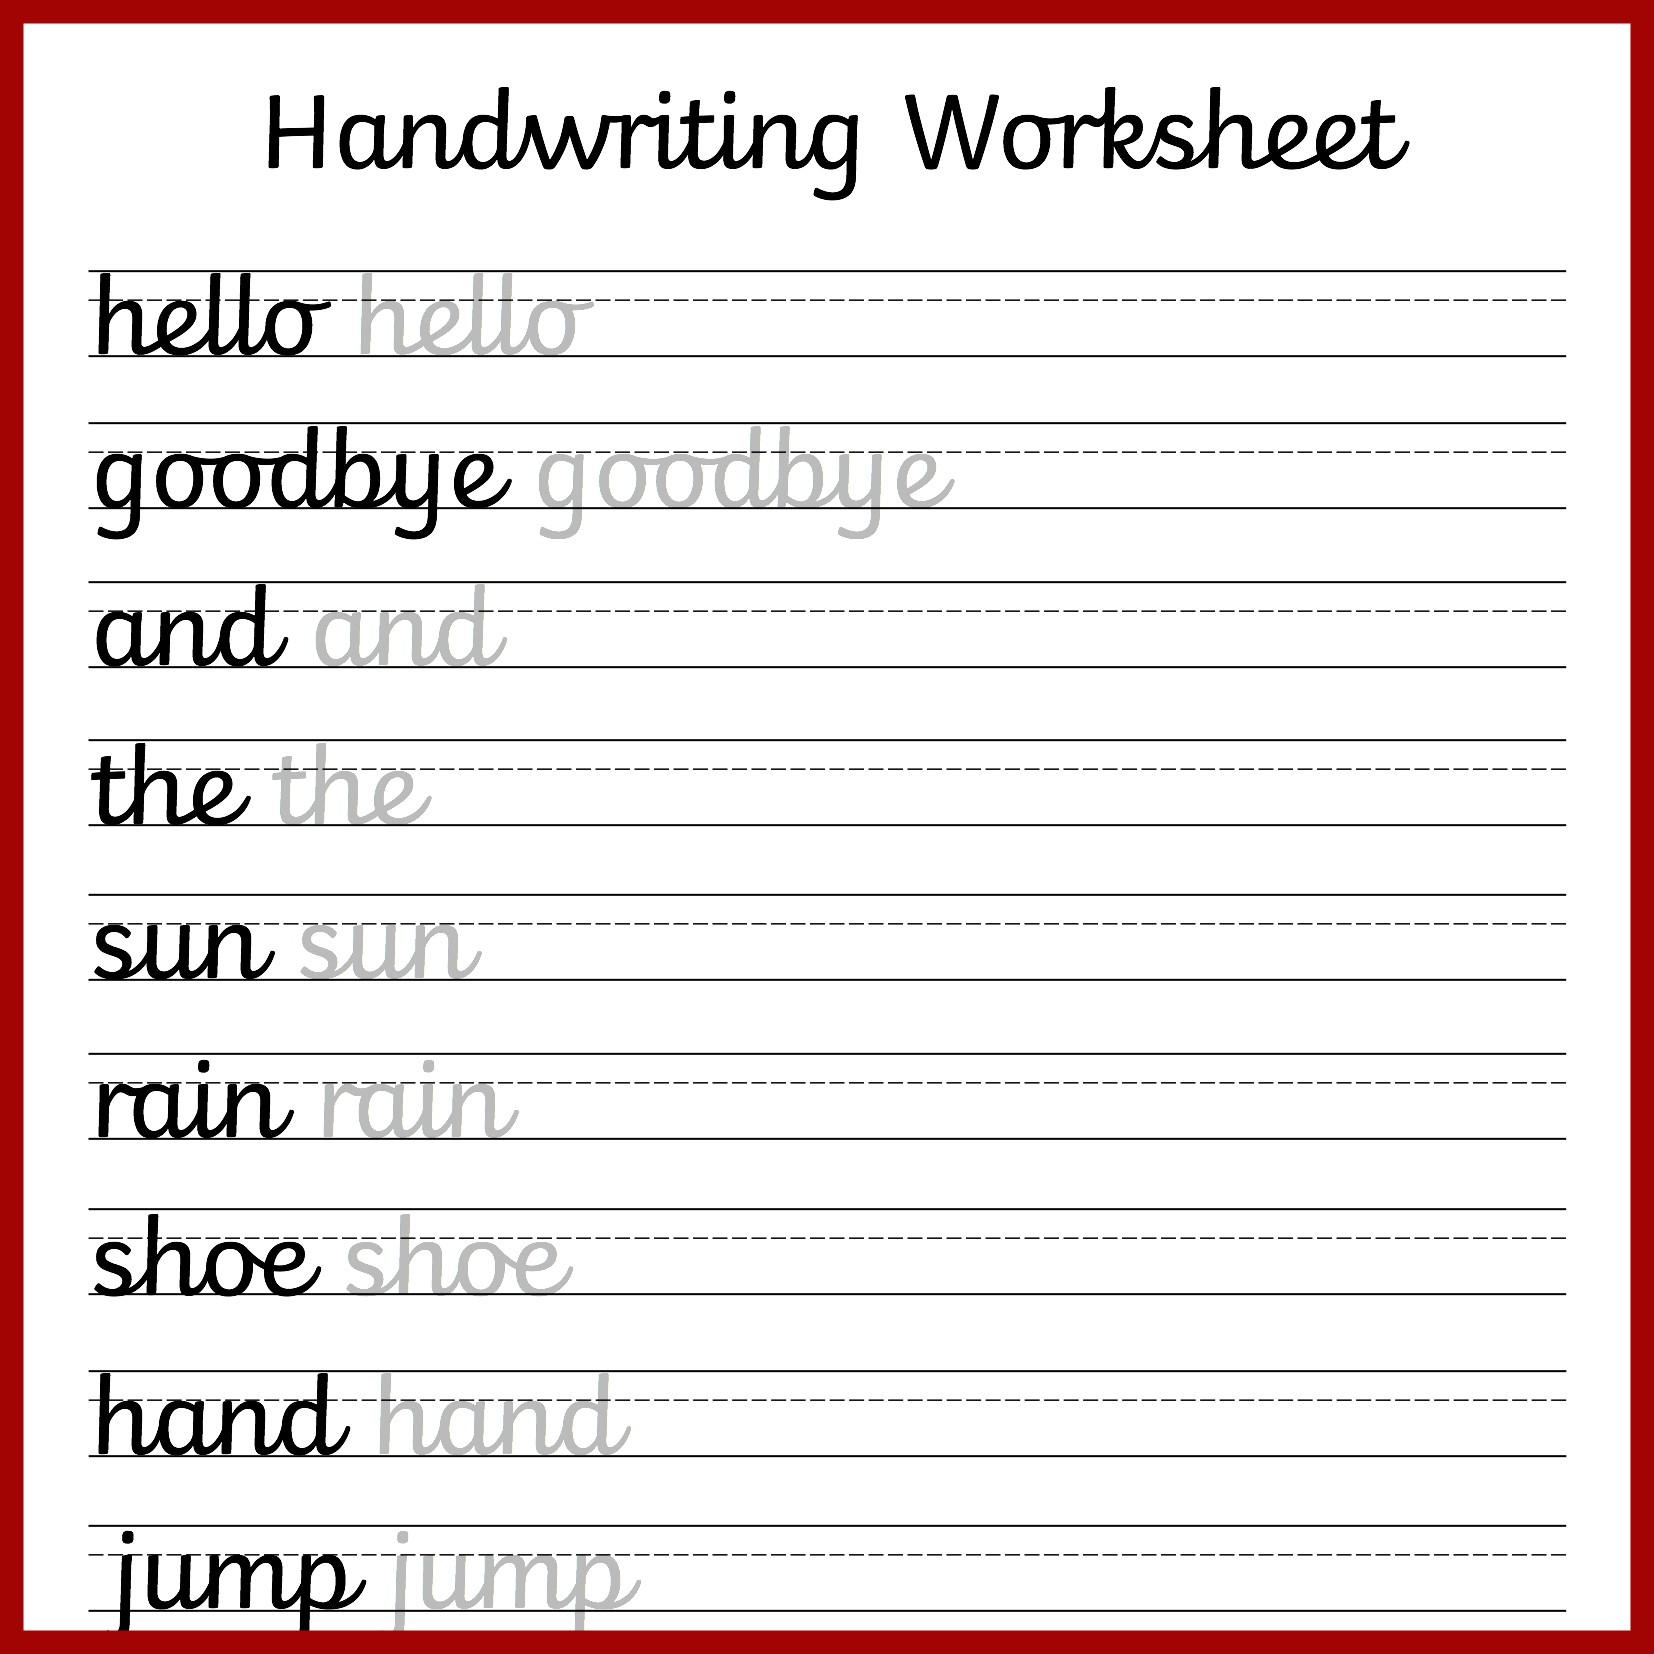 Free Preschool Writing Worksheets – With Kindergarten Handwriting | Free Printable Writing Worksheets For Kindergarten